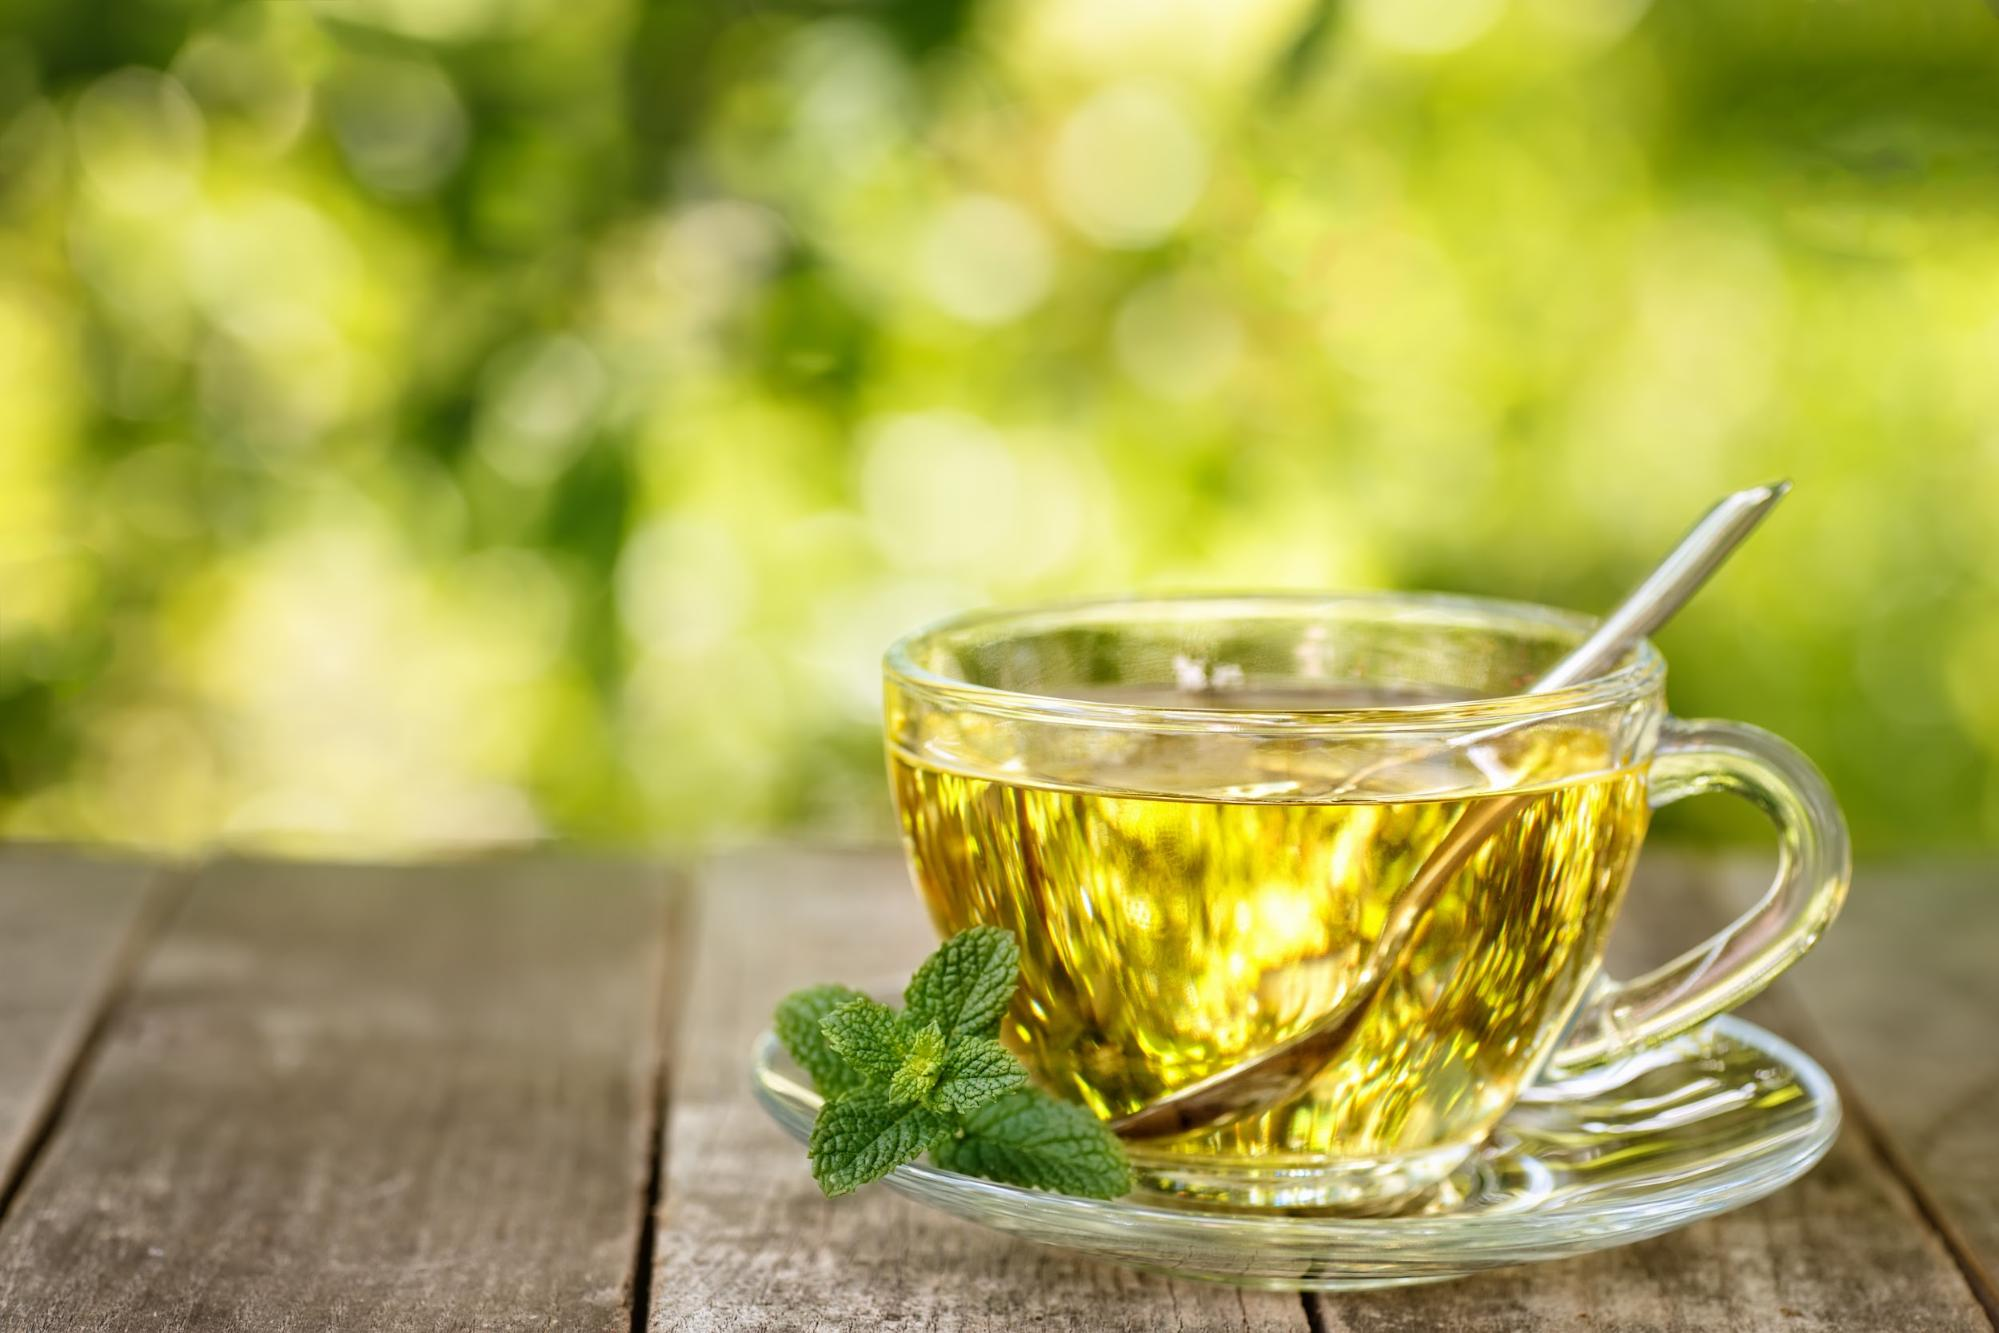 Mint tea on a glass teacup & saucer with mint leaves